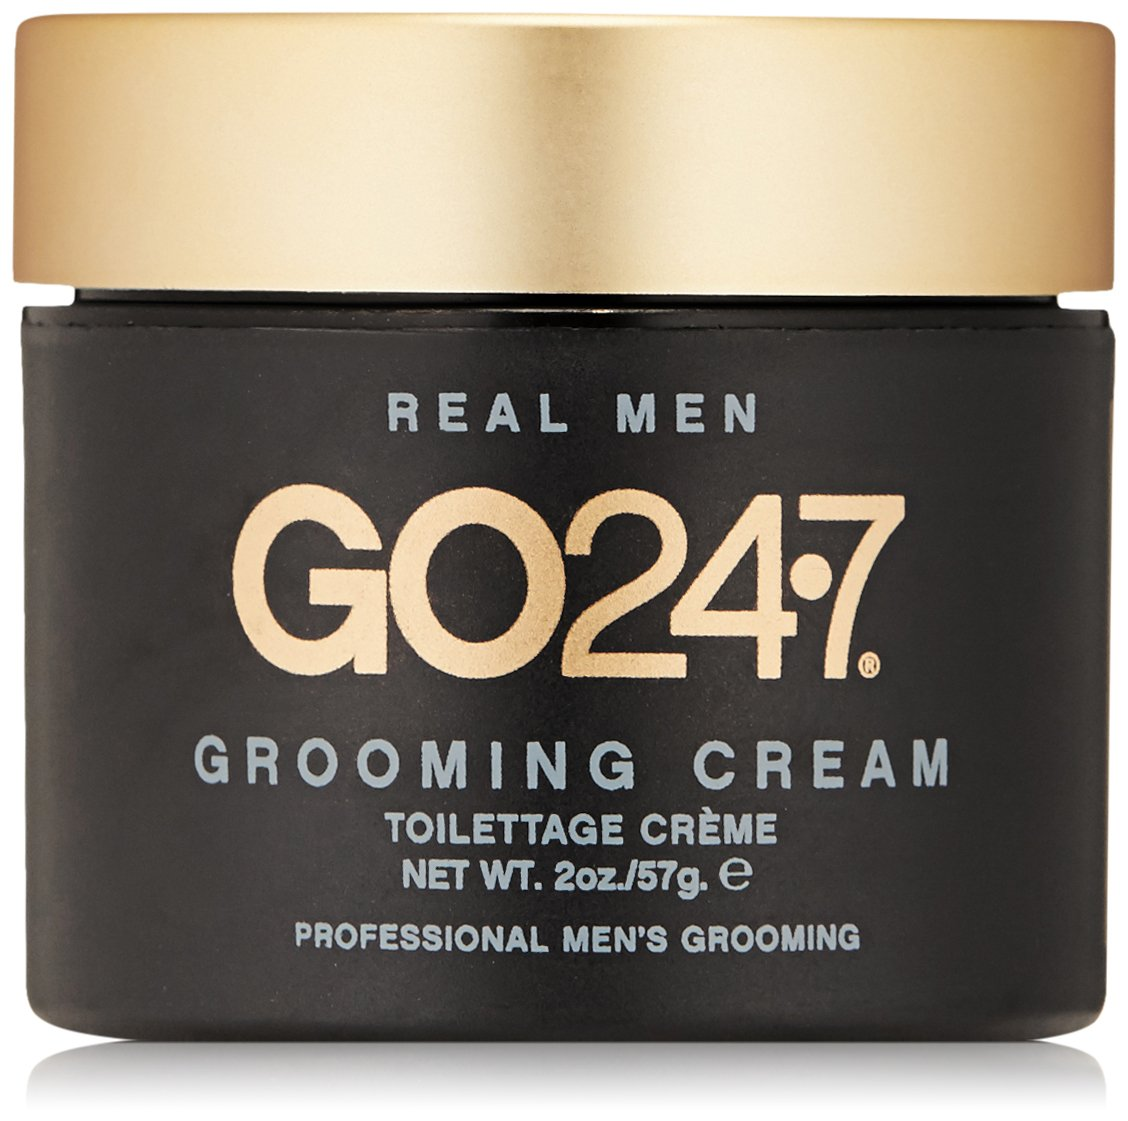 Real Men Grooming Cream by GO247 for Men - 2 oz Cream M-HC-1273